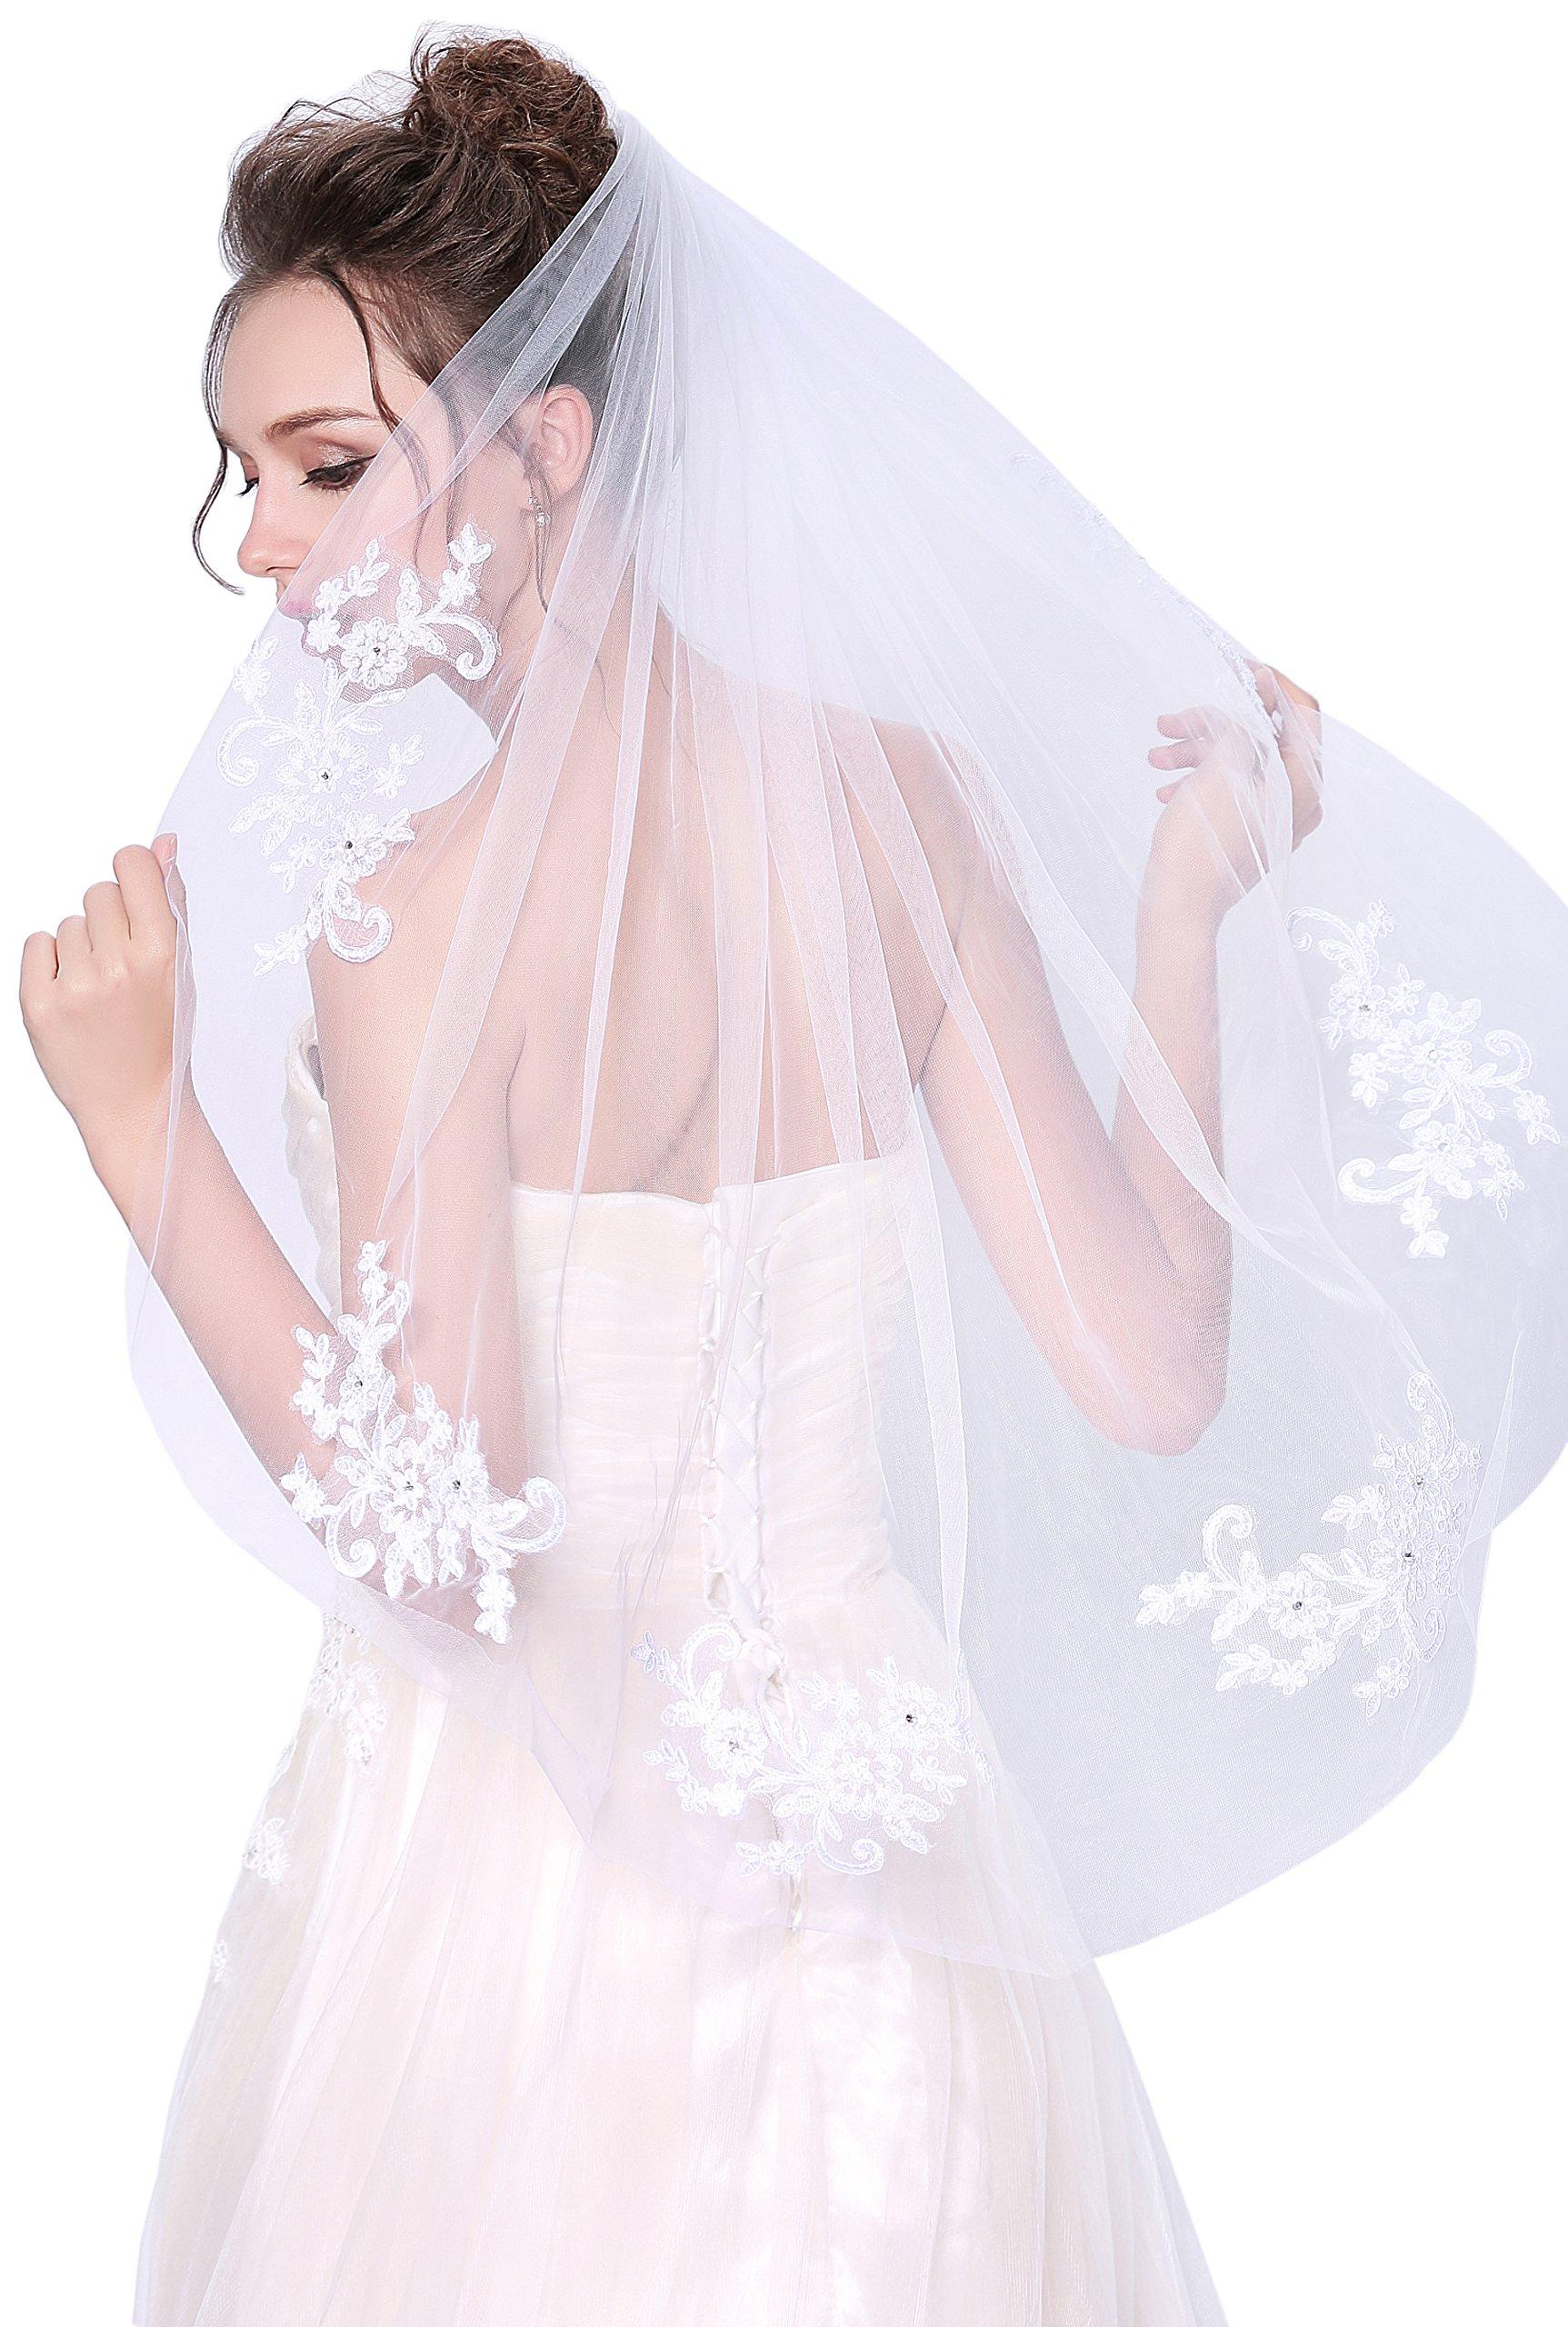 Deceny CB Wedding Veil Lace White Bridal Veil with Rhinestones 1 Tier